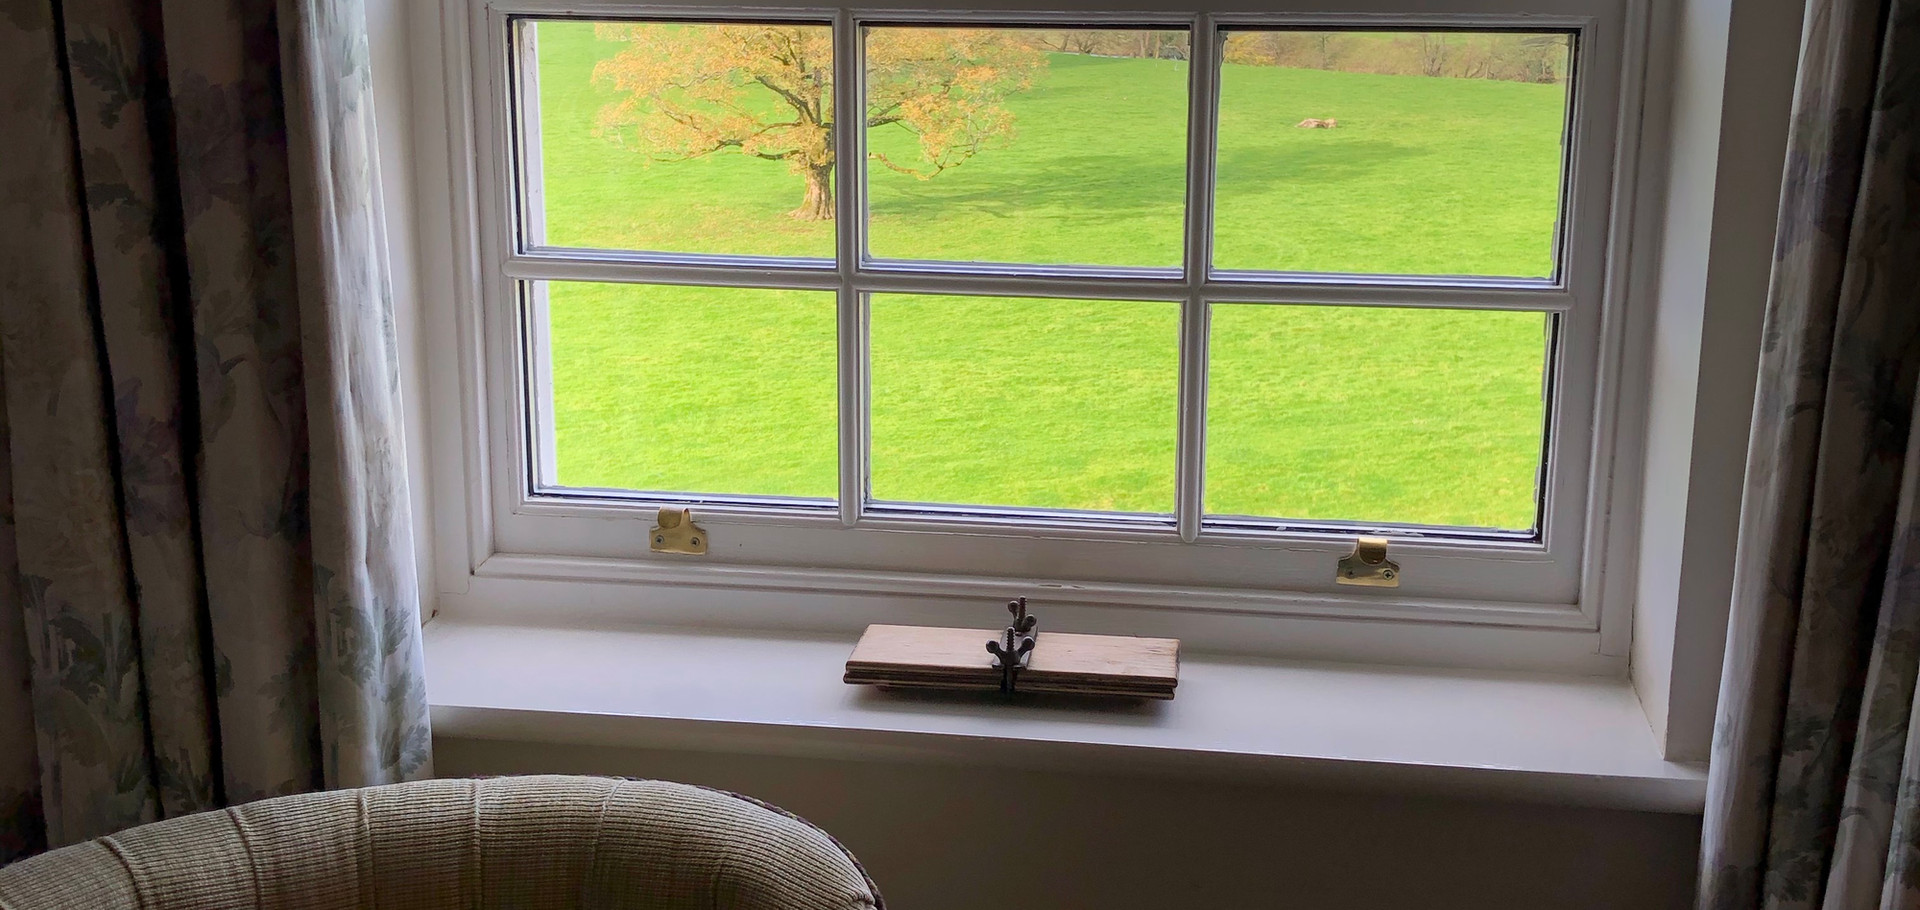 Room 19 window view